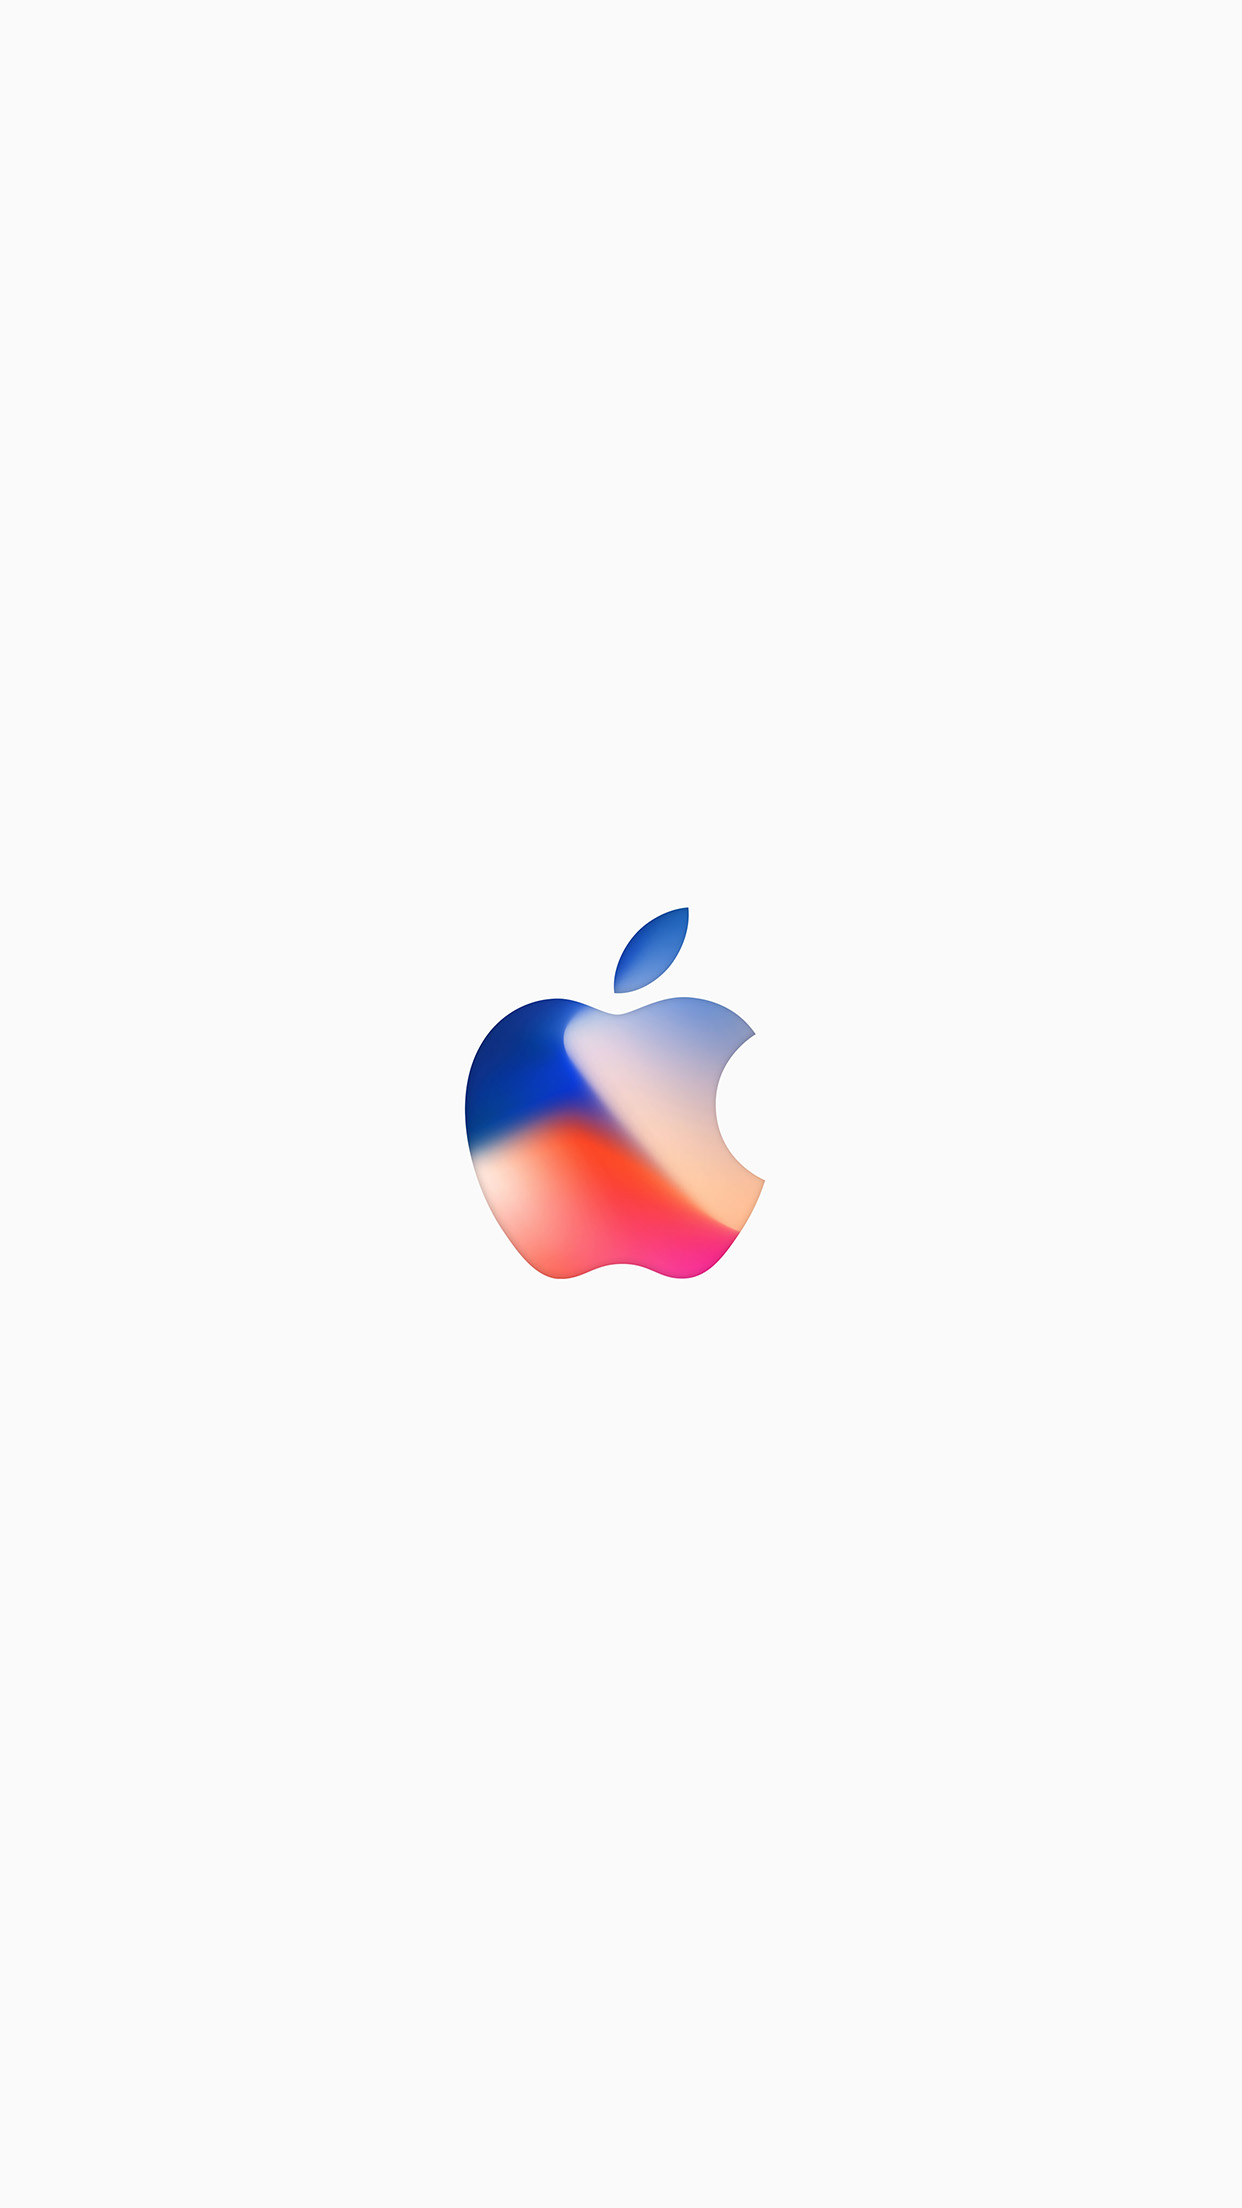 Iphone7papers Com Iphone7 Wallpaper Bb78 Apple Iphonex